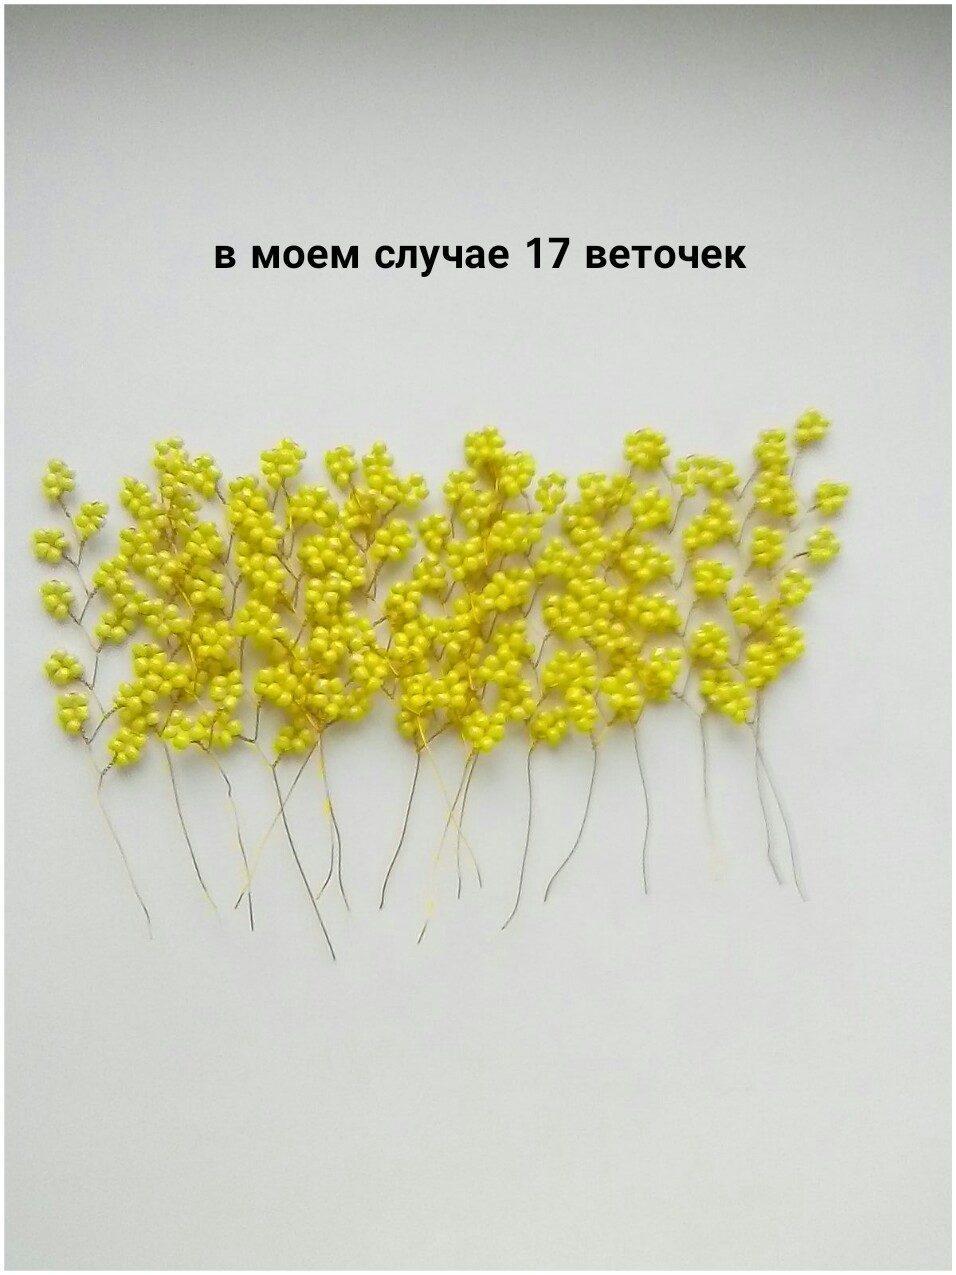 Композиции Image?id=862330456218&t=3&plc=WEB&tkn=*RzooTC04uVcRqJKcCERLFg17GmQ